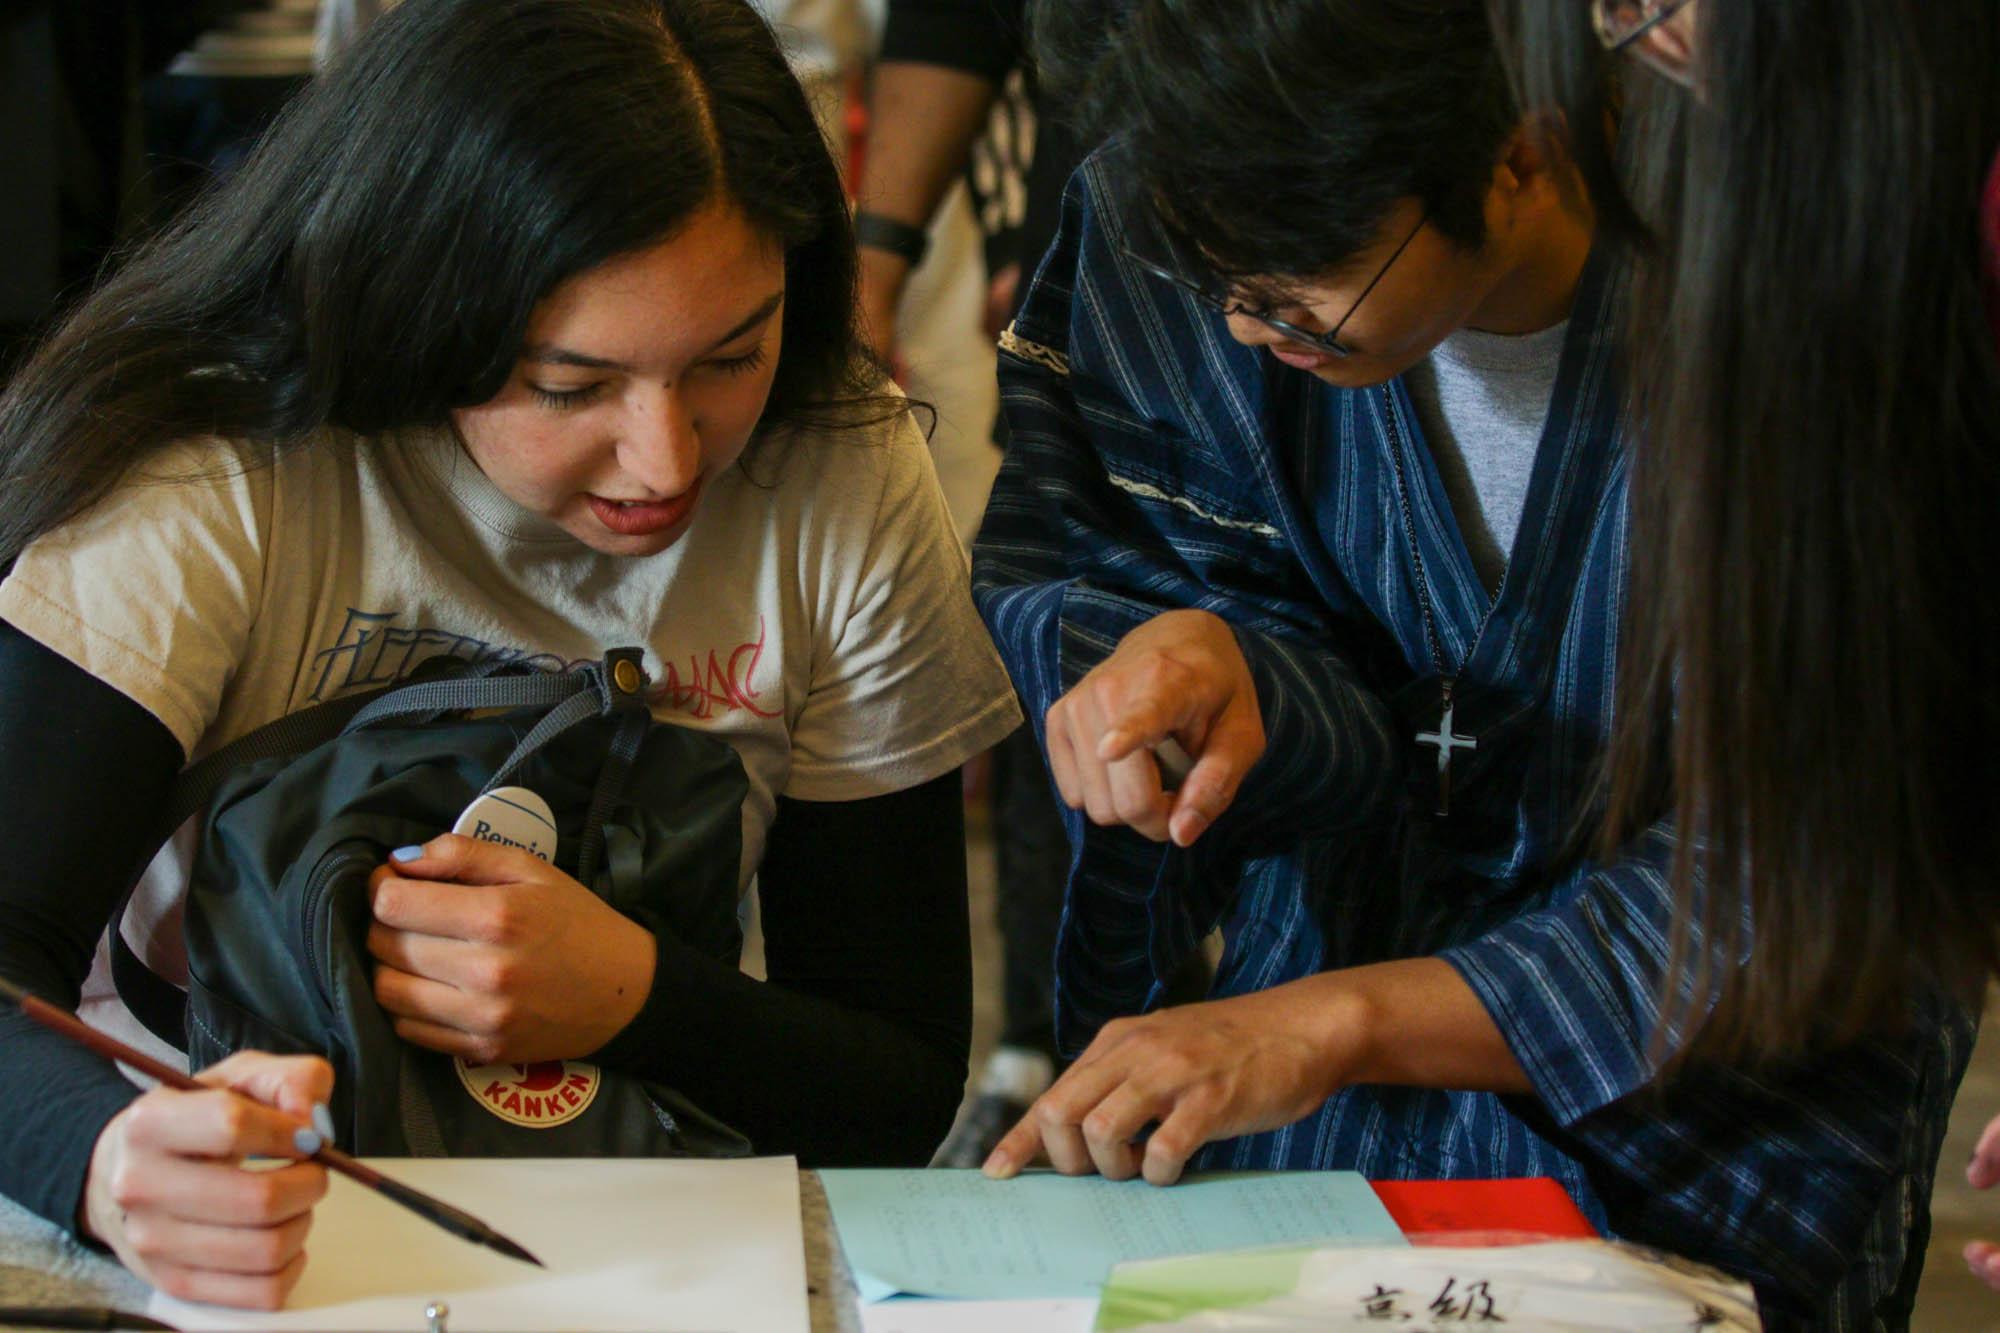 Japanese club brings Japanese culture